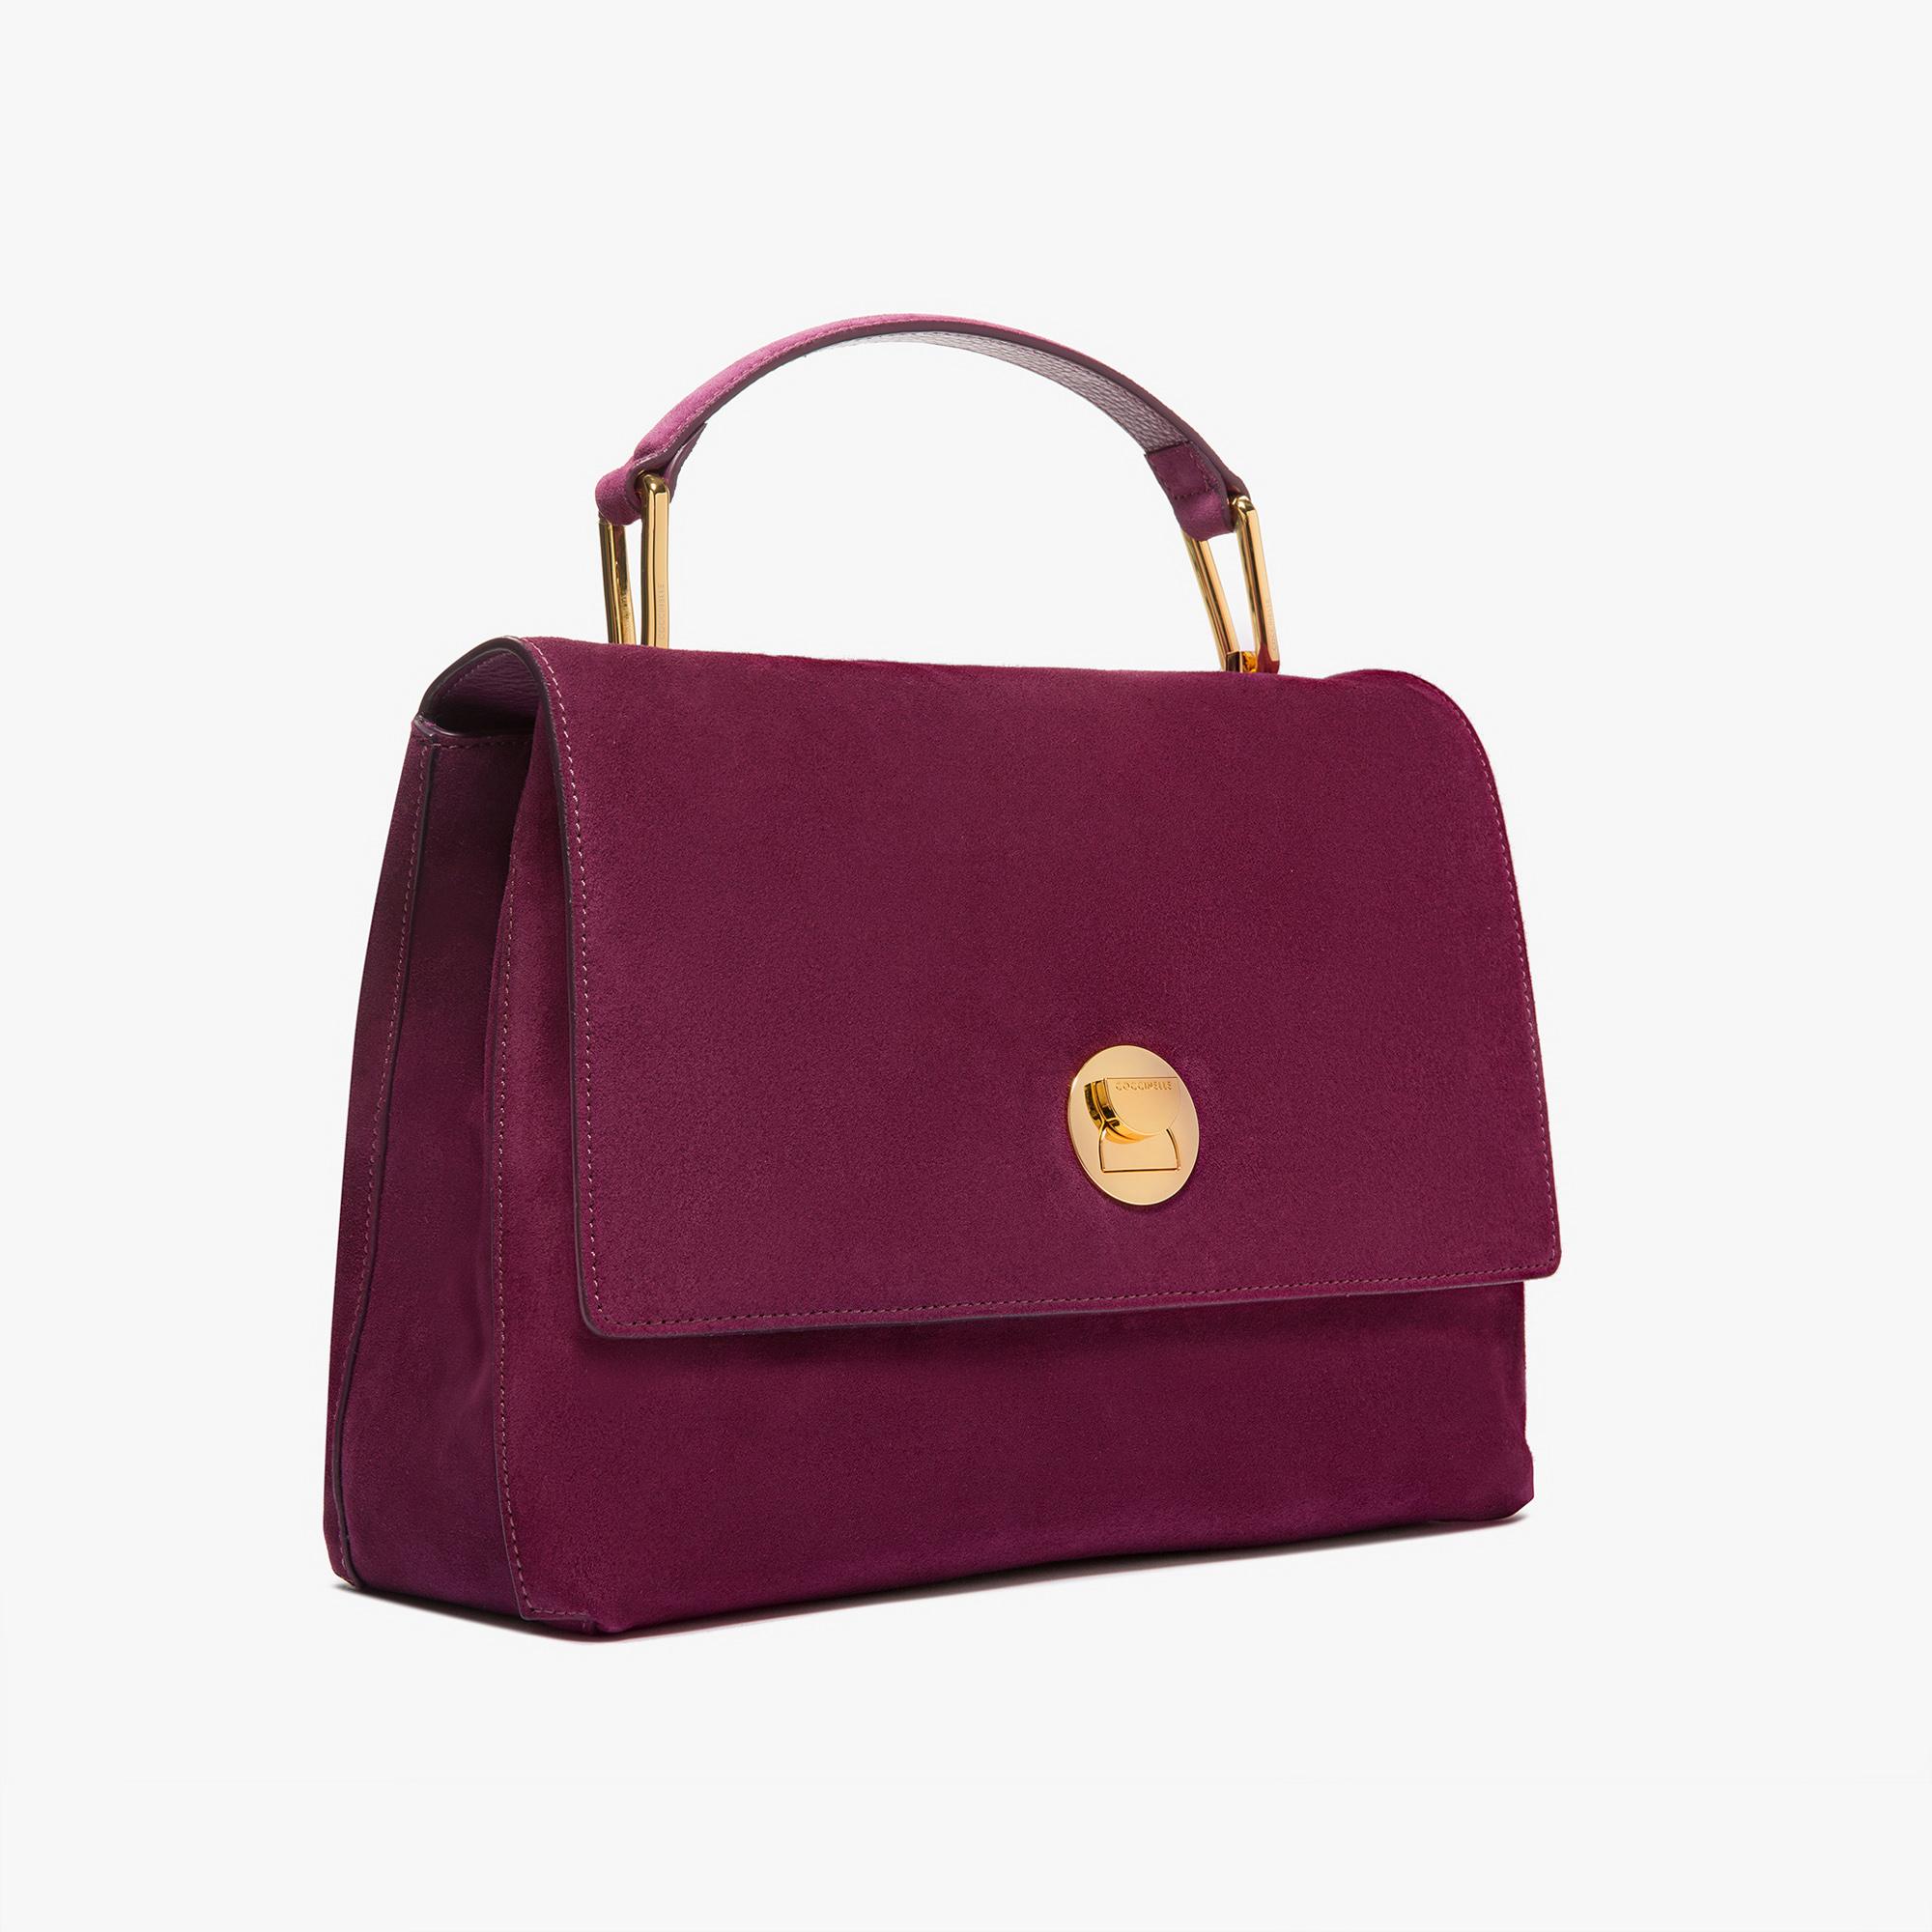 Coccinelle Liya suede handbag